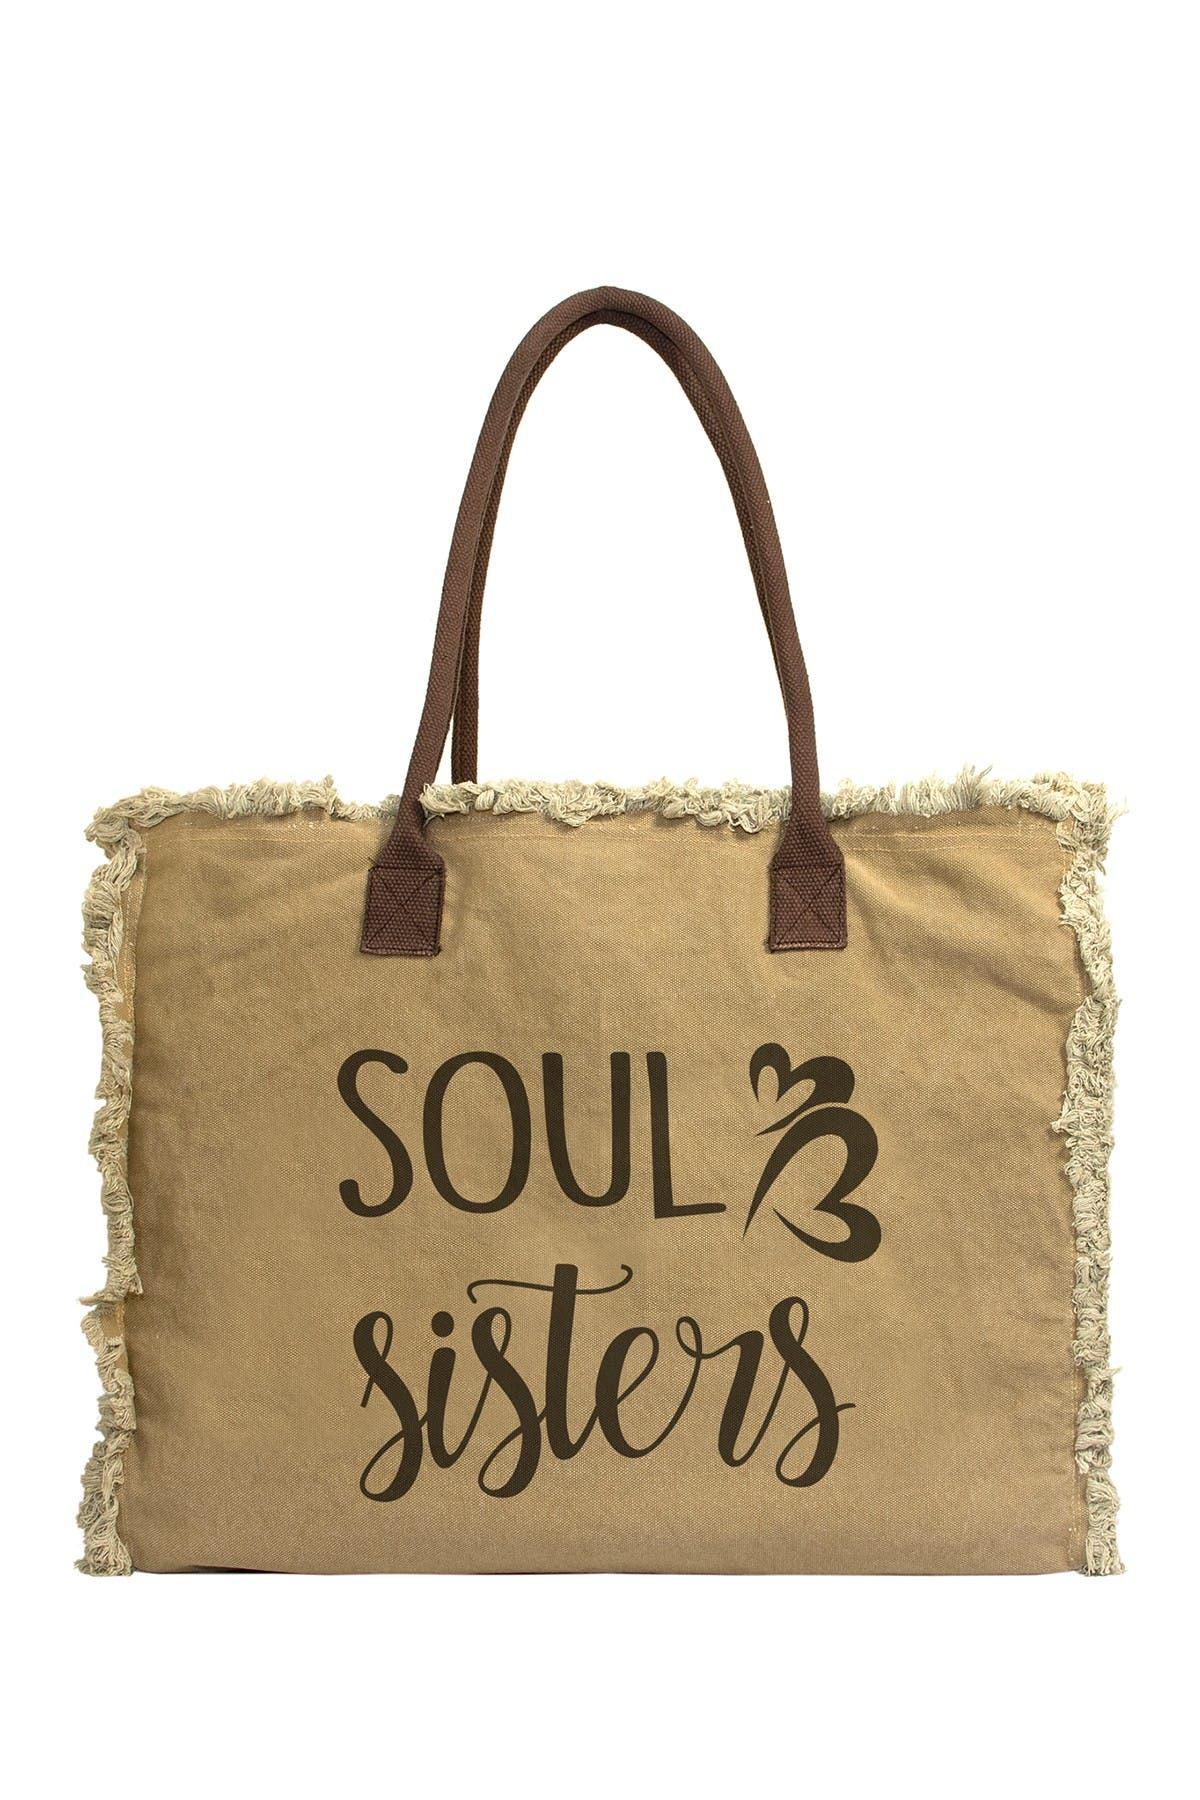 Image of Vintage Addiction Soul Sister Canvas Tote Bag